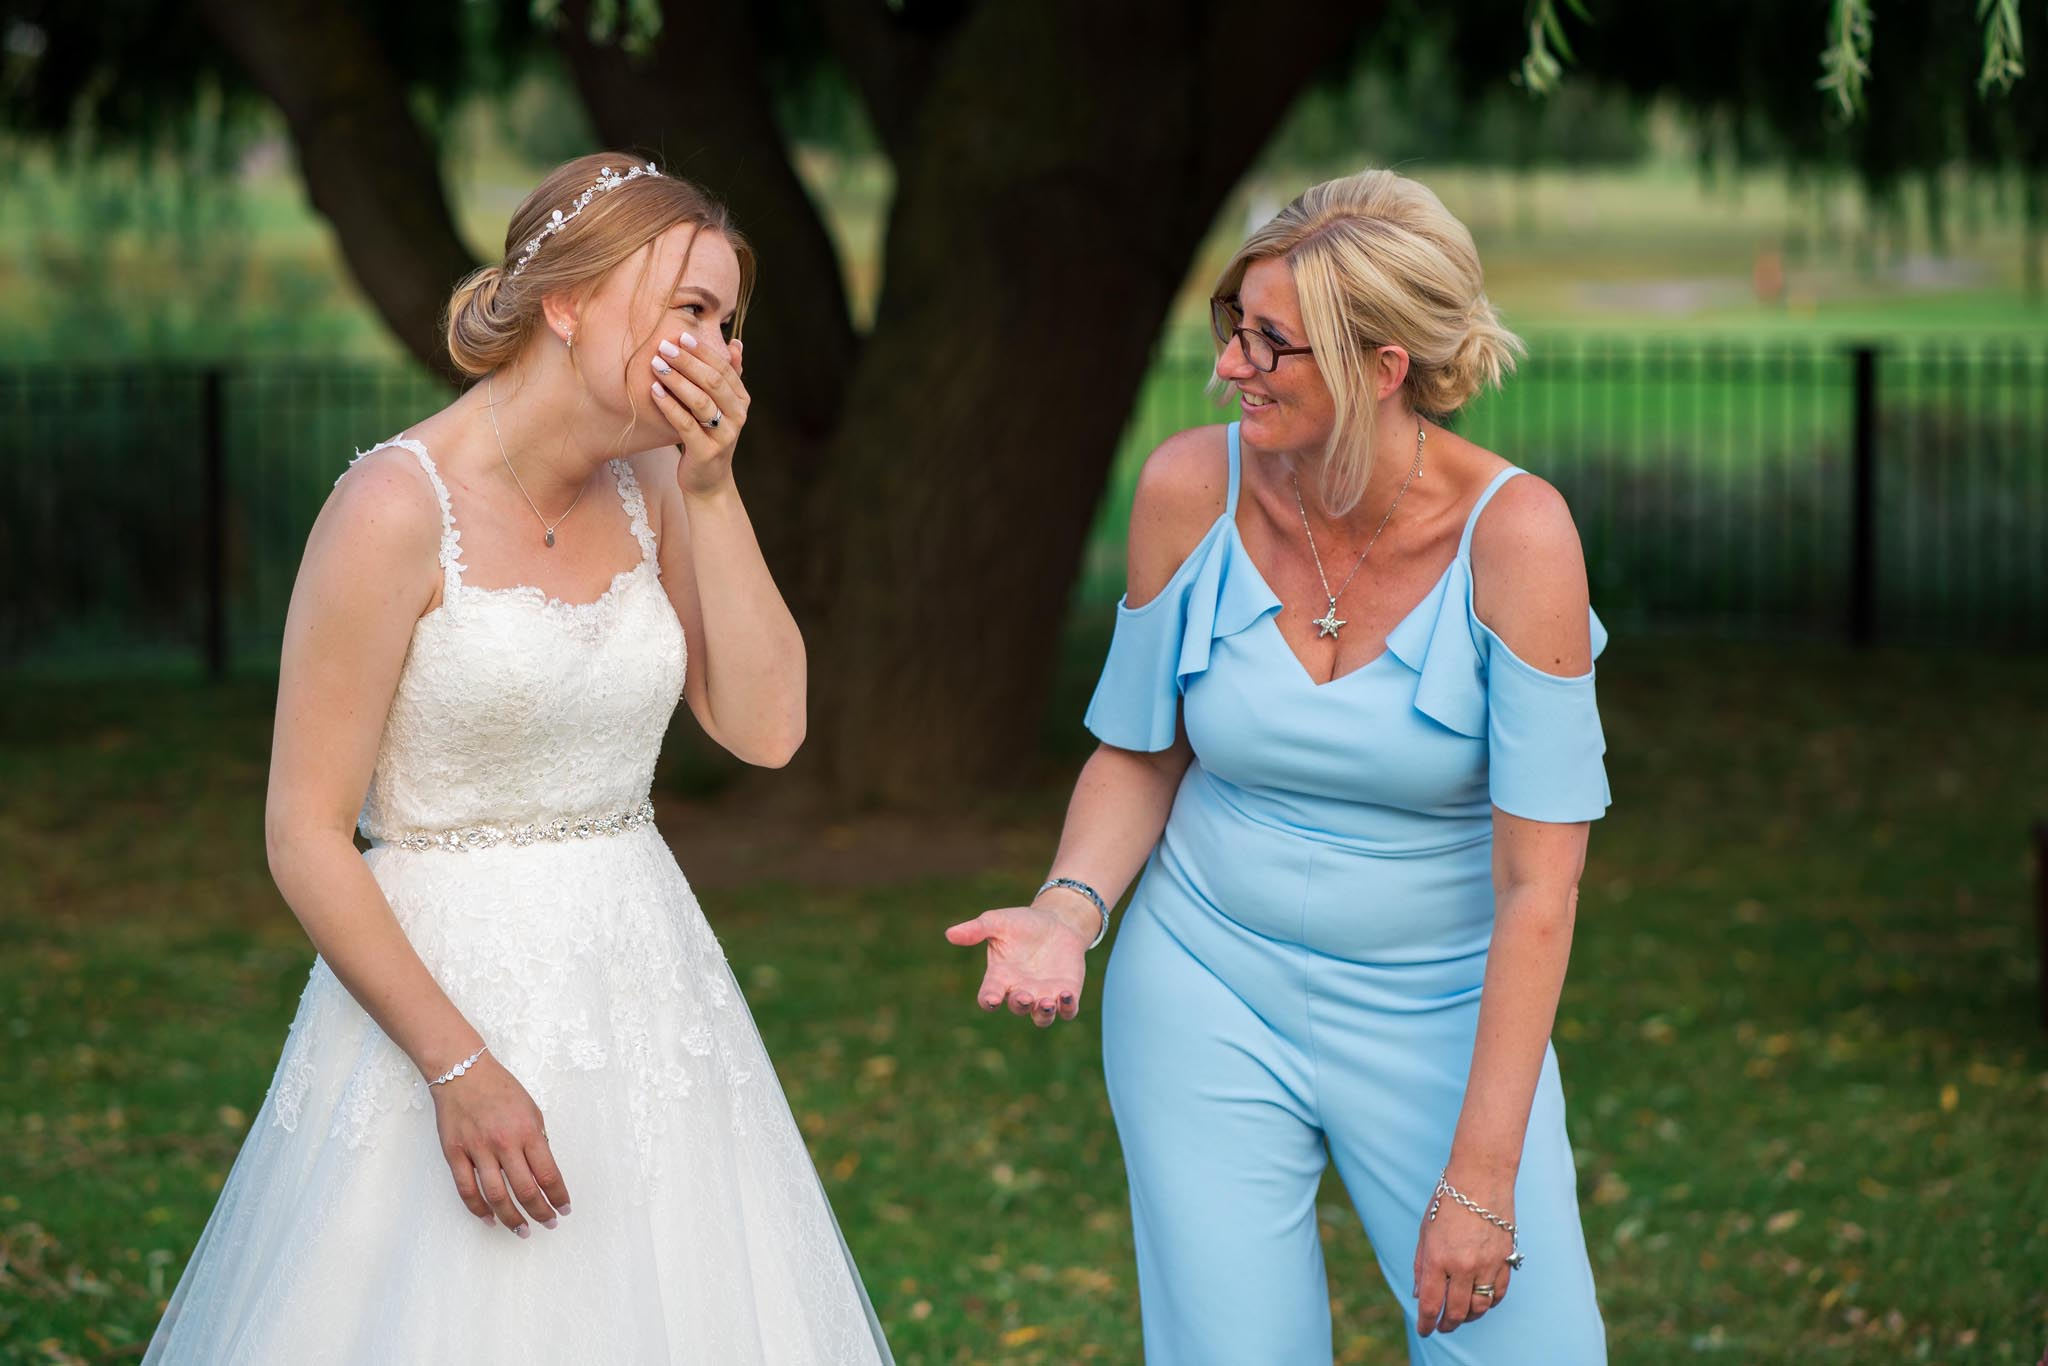 784-family-friends-Luke-Yasmin-The-Rayleigh-Club-Wedding-Photography.jpg